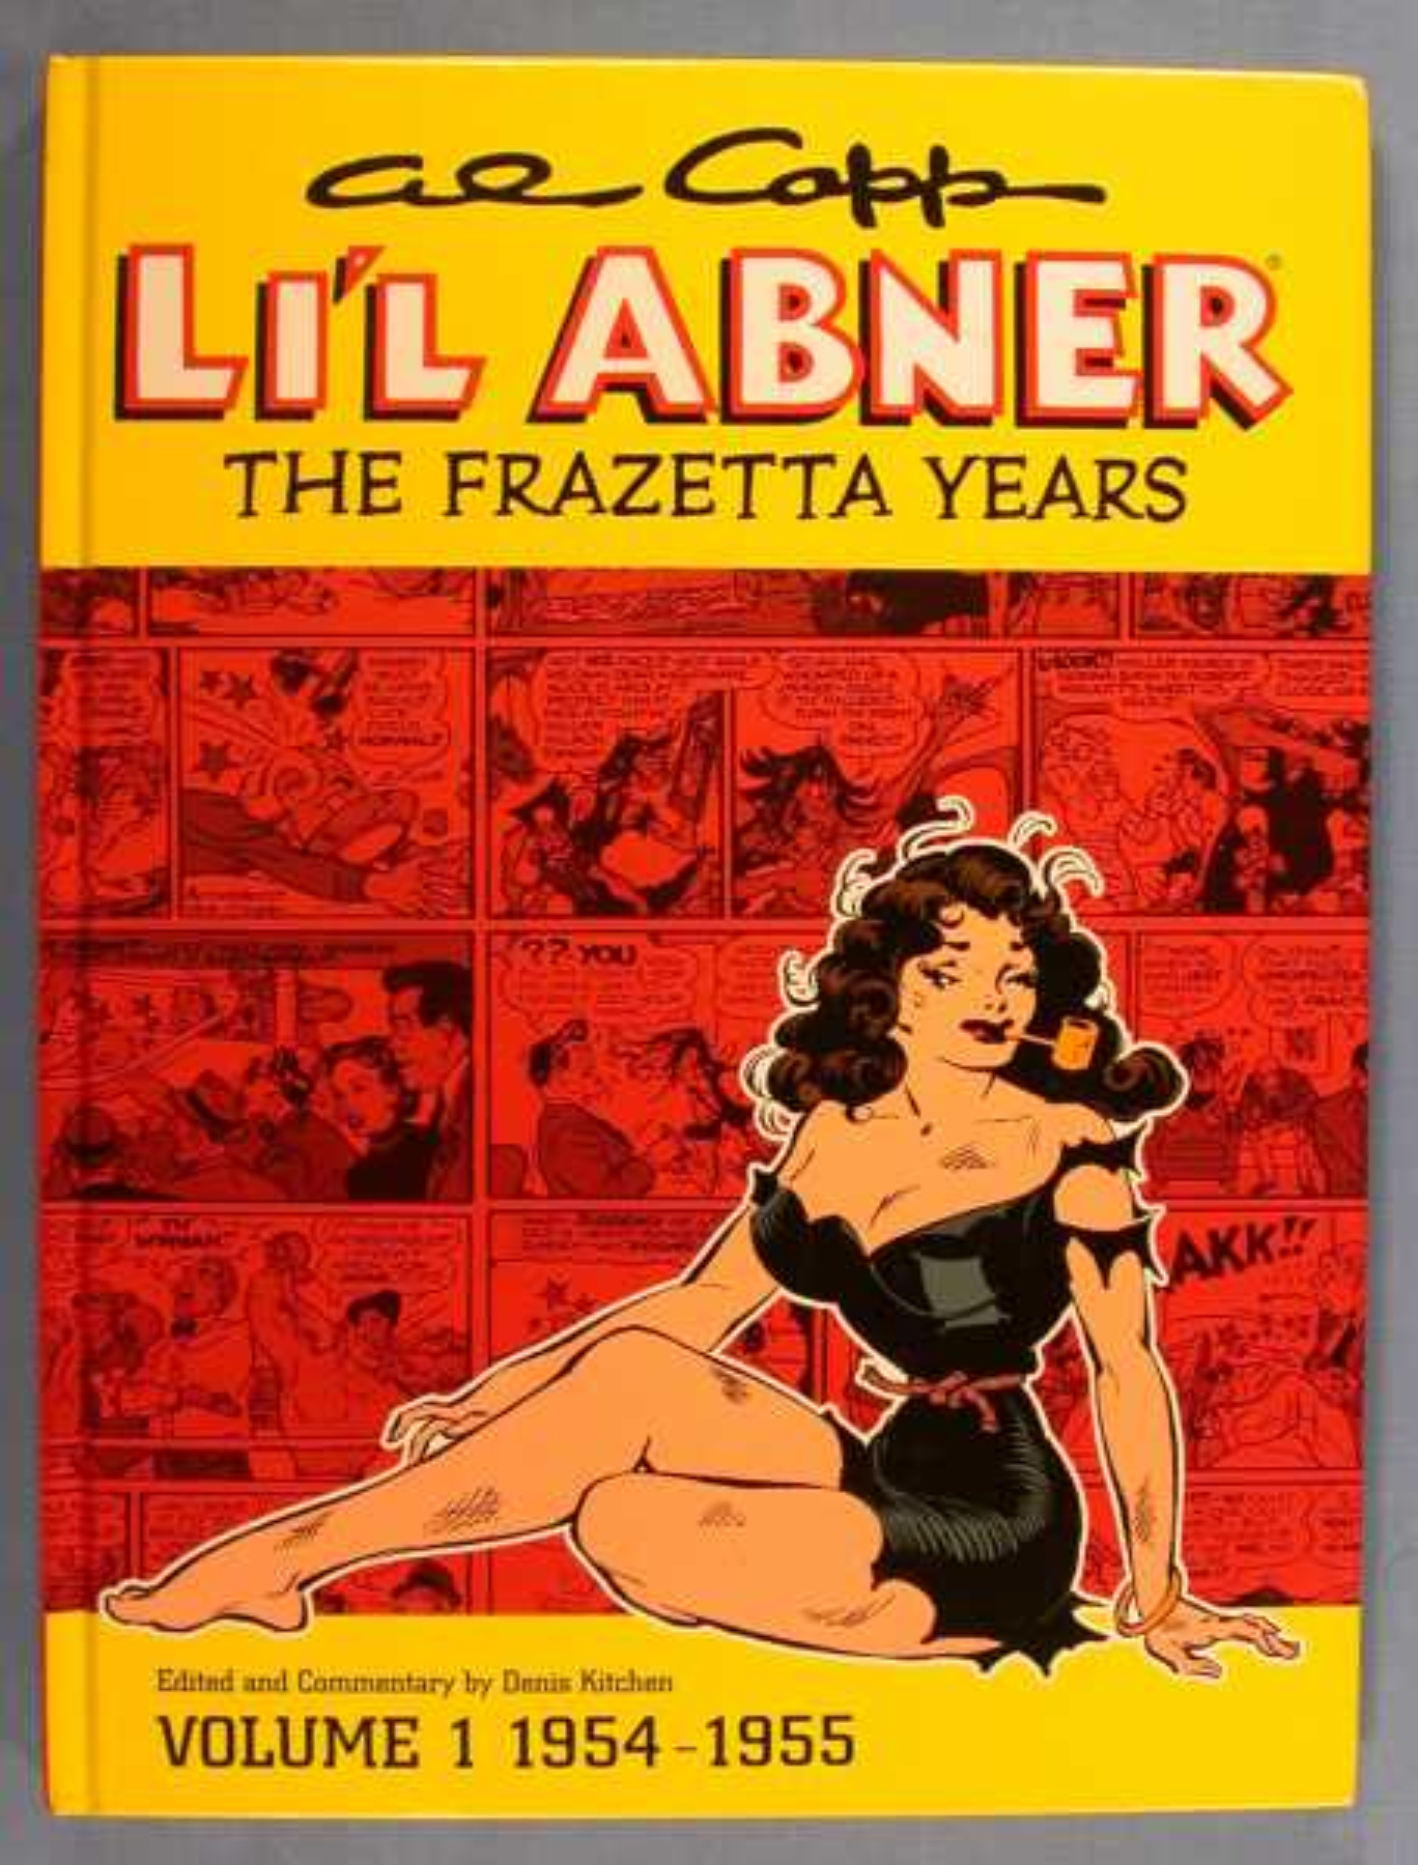 Al Capp's Li'l Abner: The Frazetta Years, Volume 1 1954-55, Frazetta, Frank; Denis Kitchen (editor, commentator)